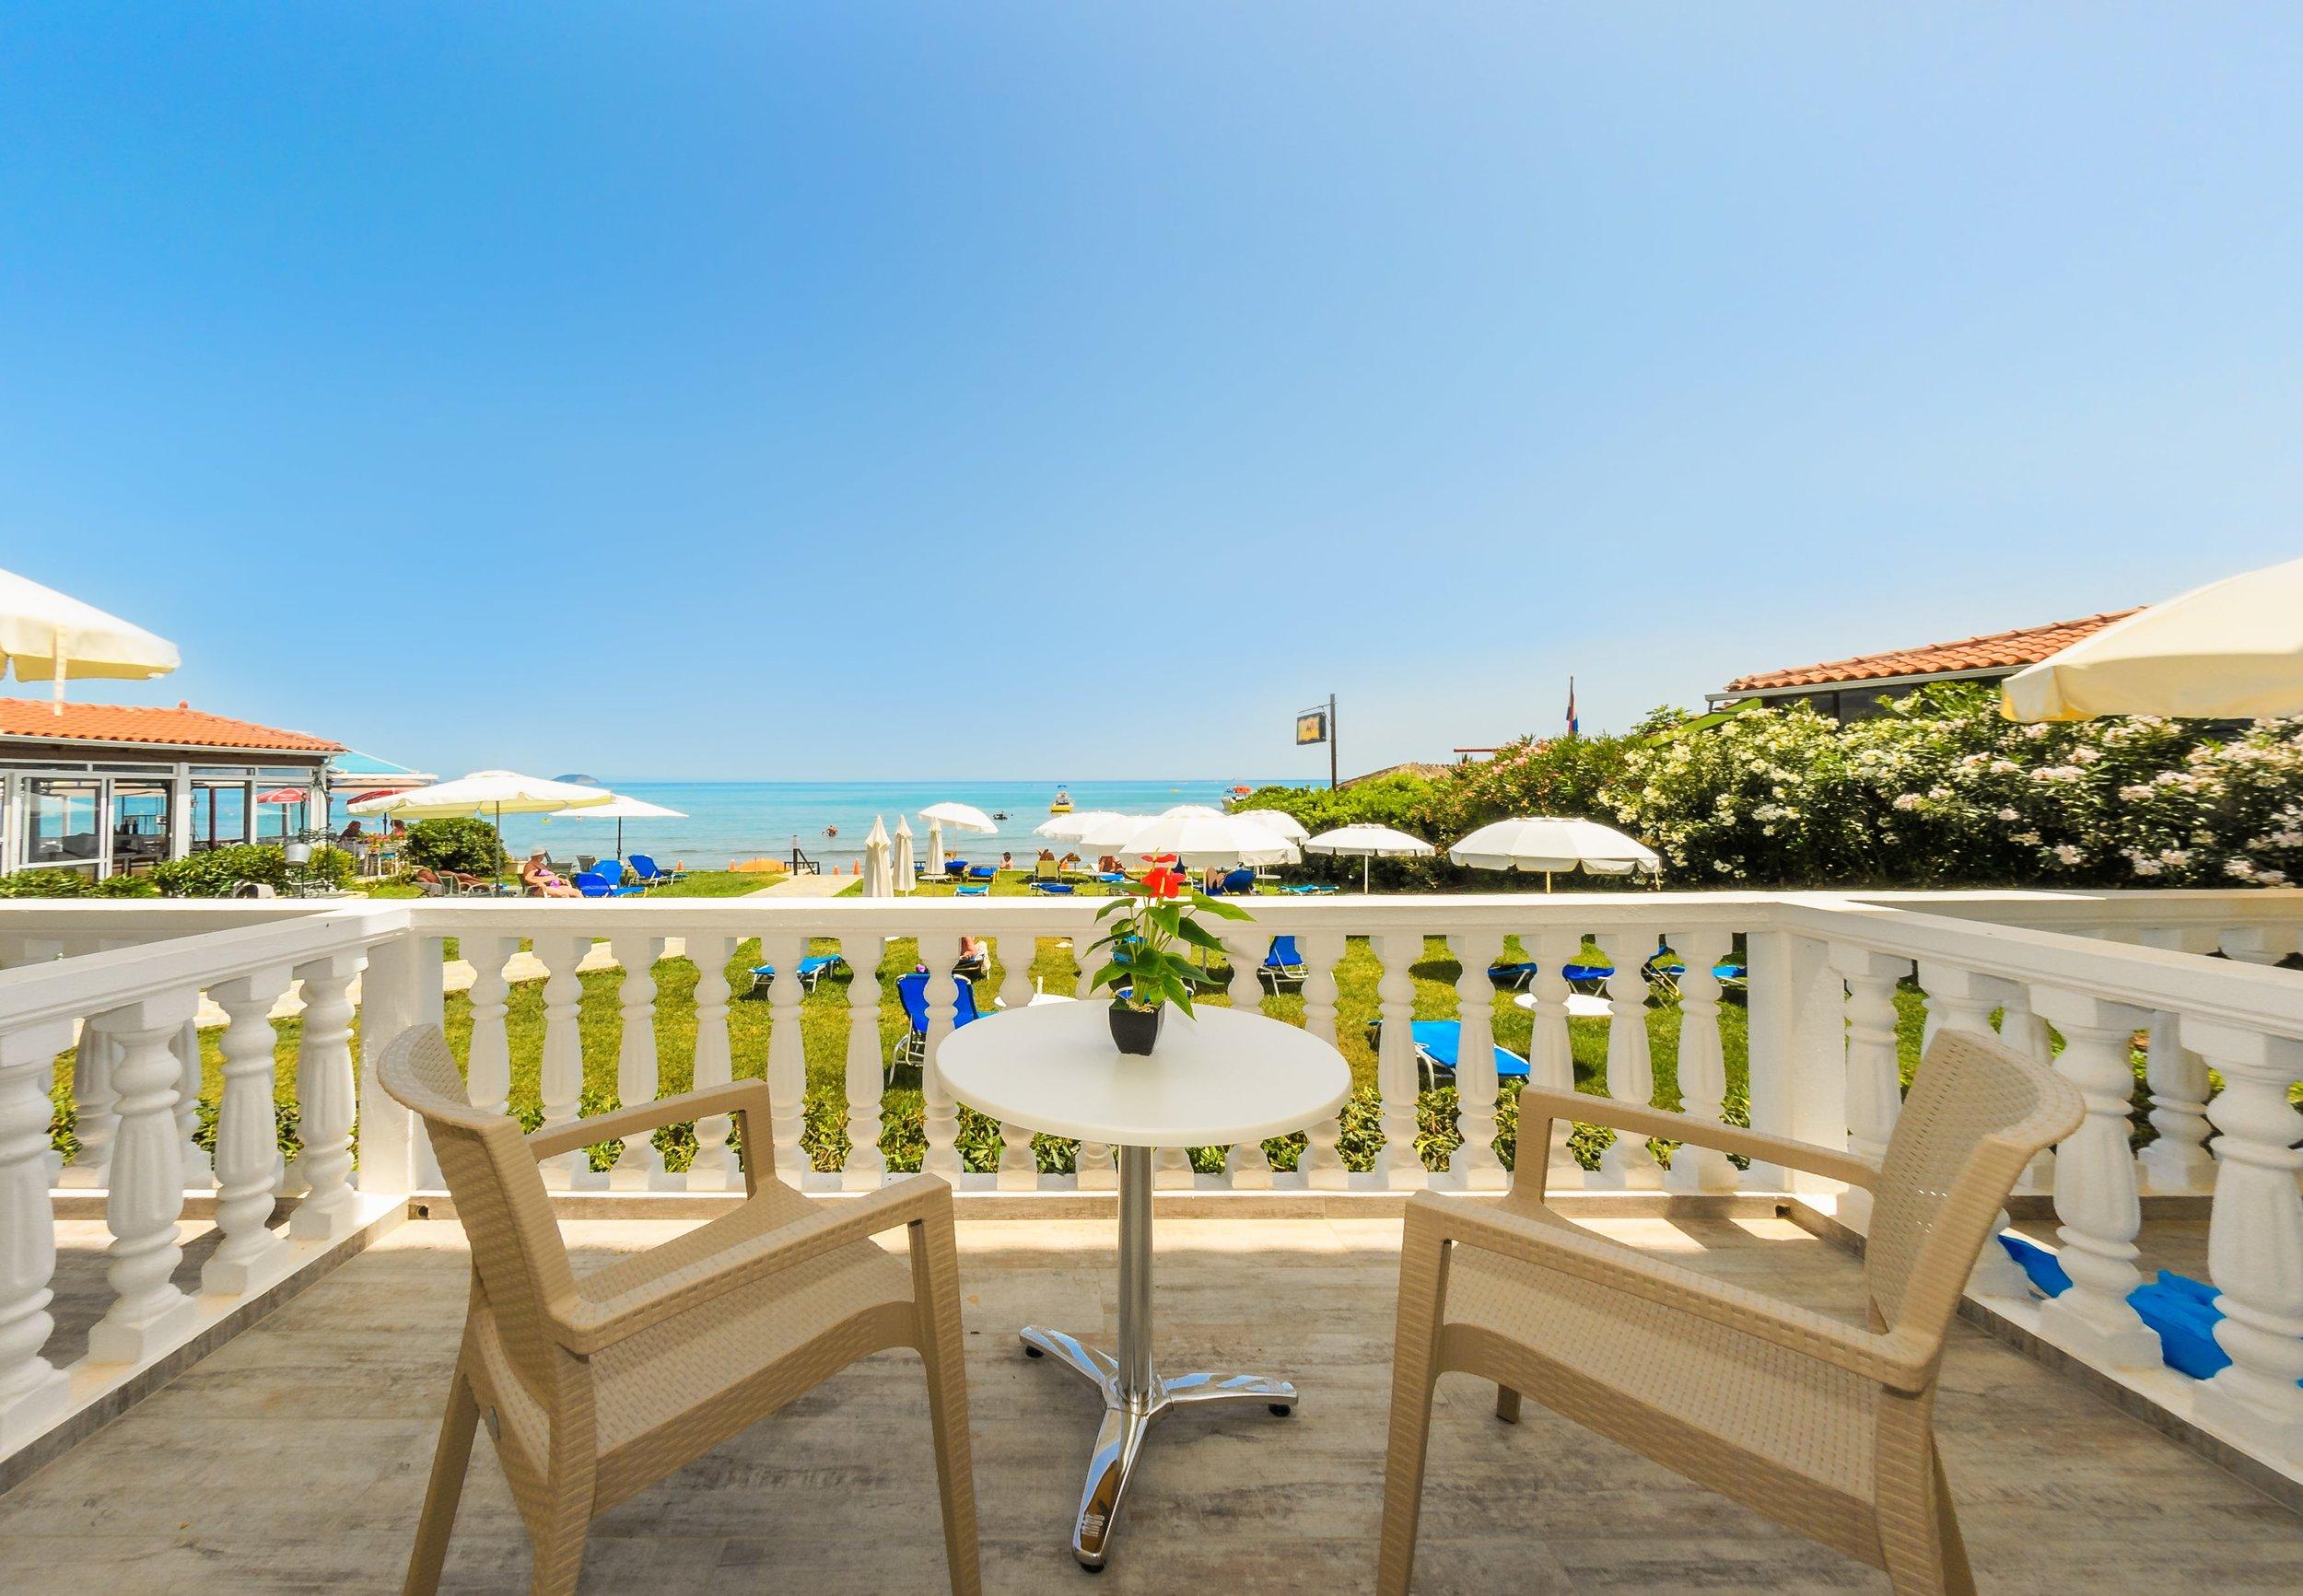 01-veranda-with-seaview-balcony-1-min.jpg